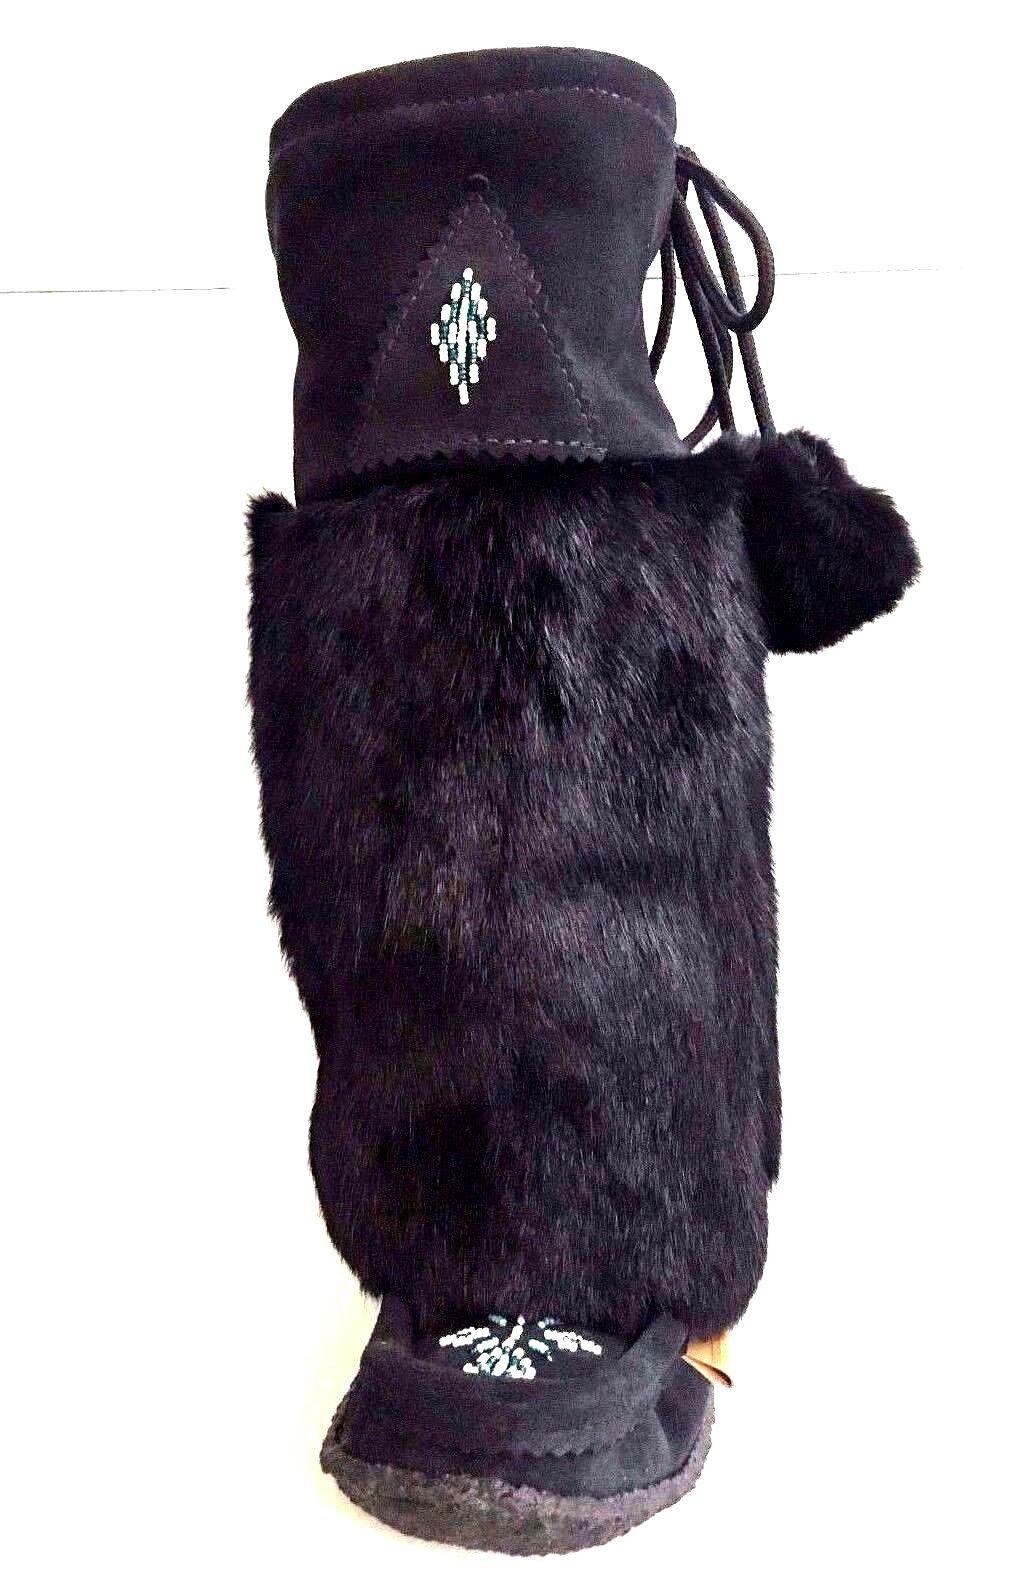 SALE. 50% OFF!!! Women's Tall Black Suede & Rabbit Fur Mukluks Multiple Sizes